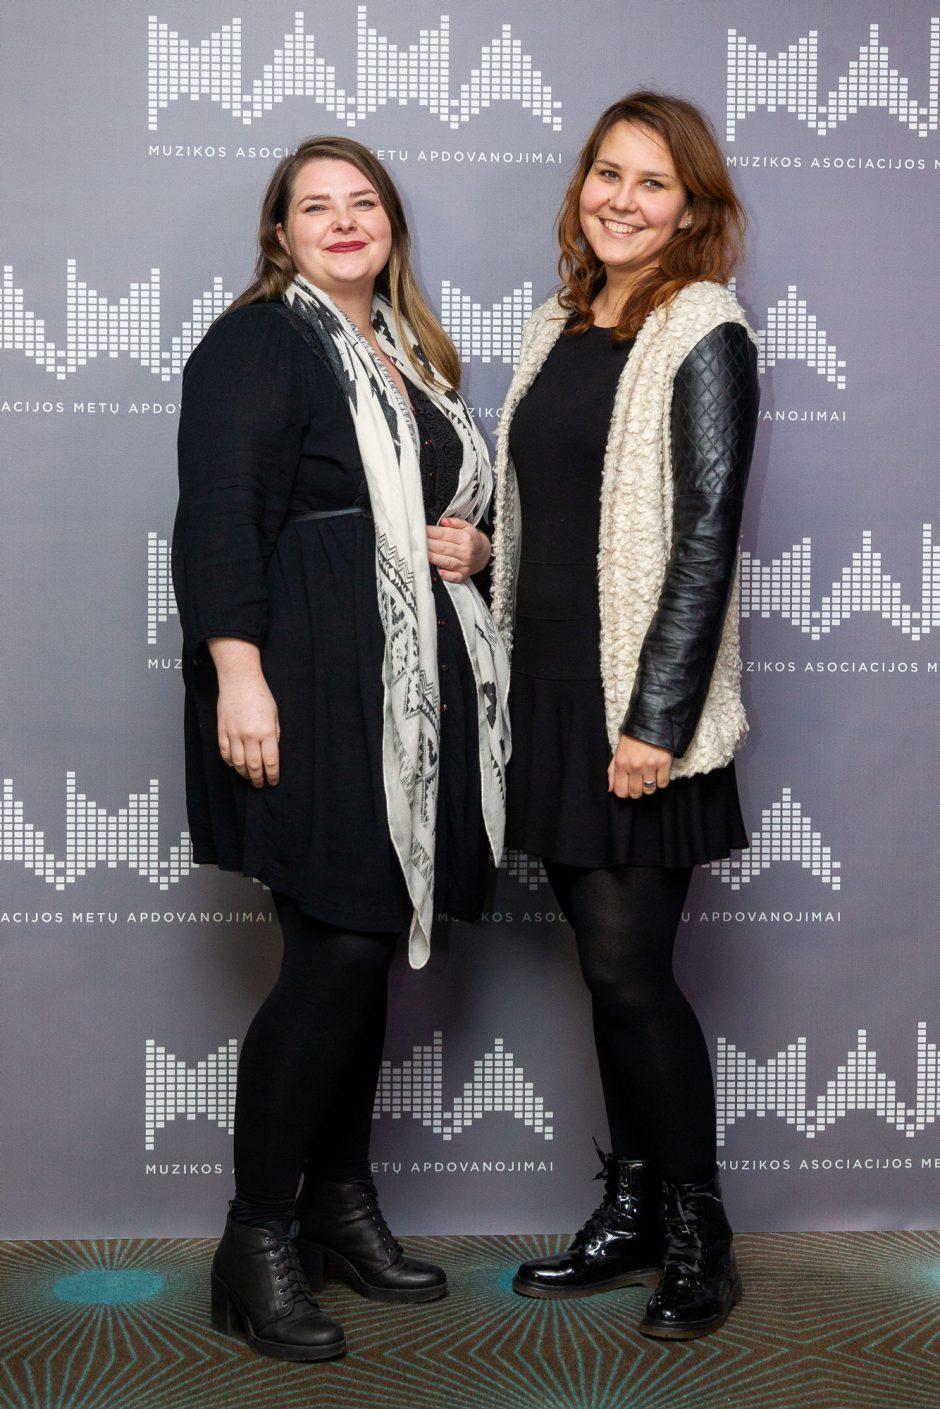 Paskelbti M.A.M.A 2018 nominantai